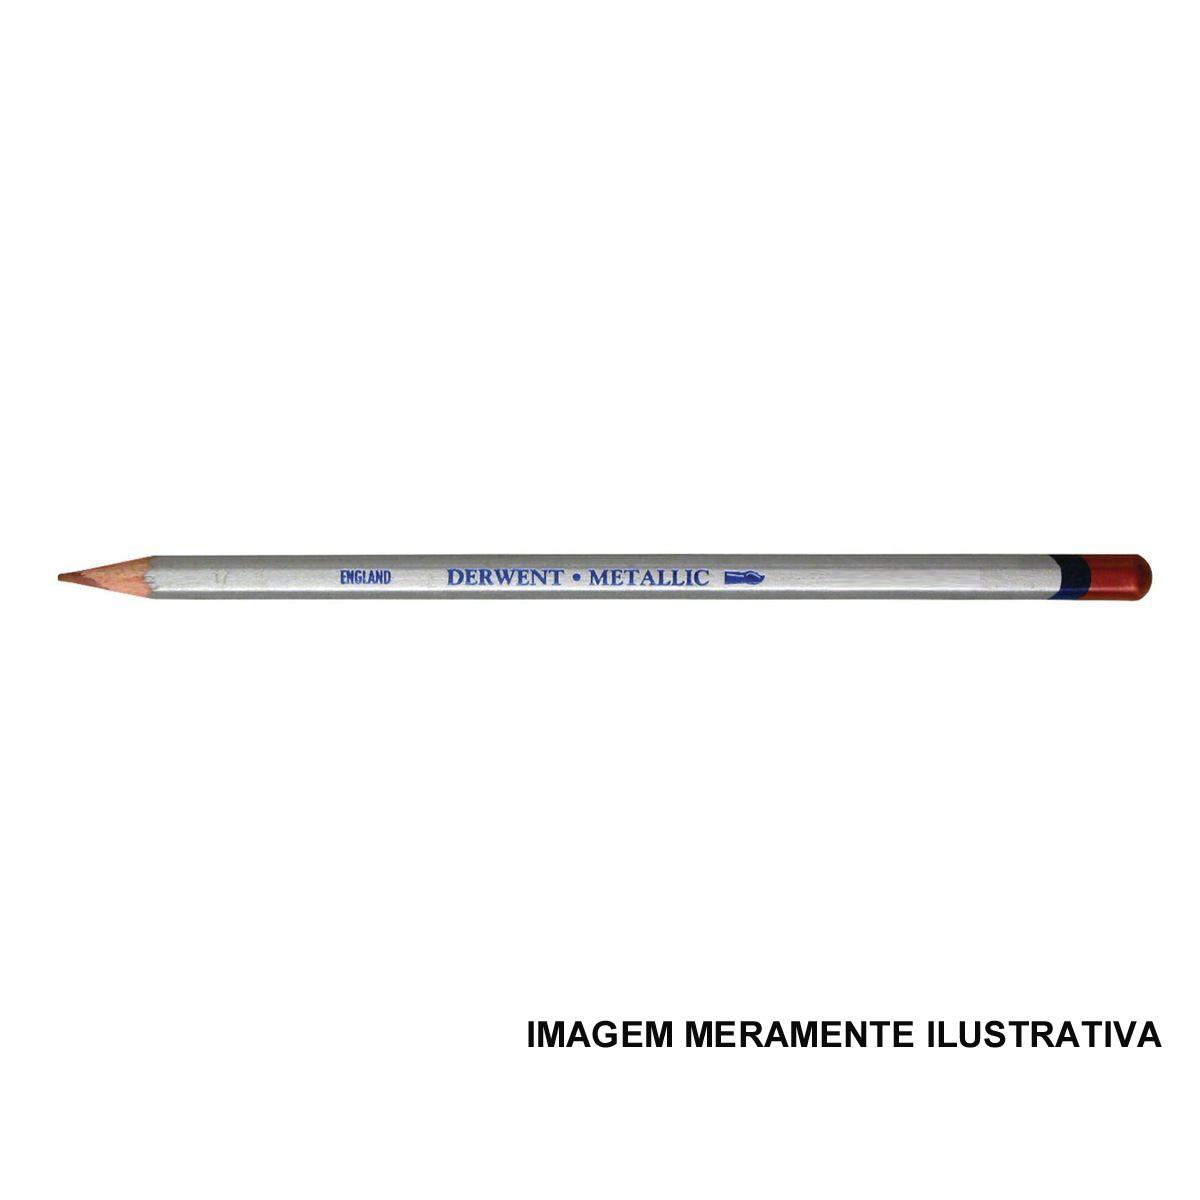 Lápis Metallic Blue (nº 12) un.